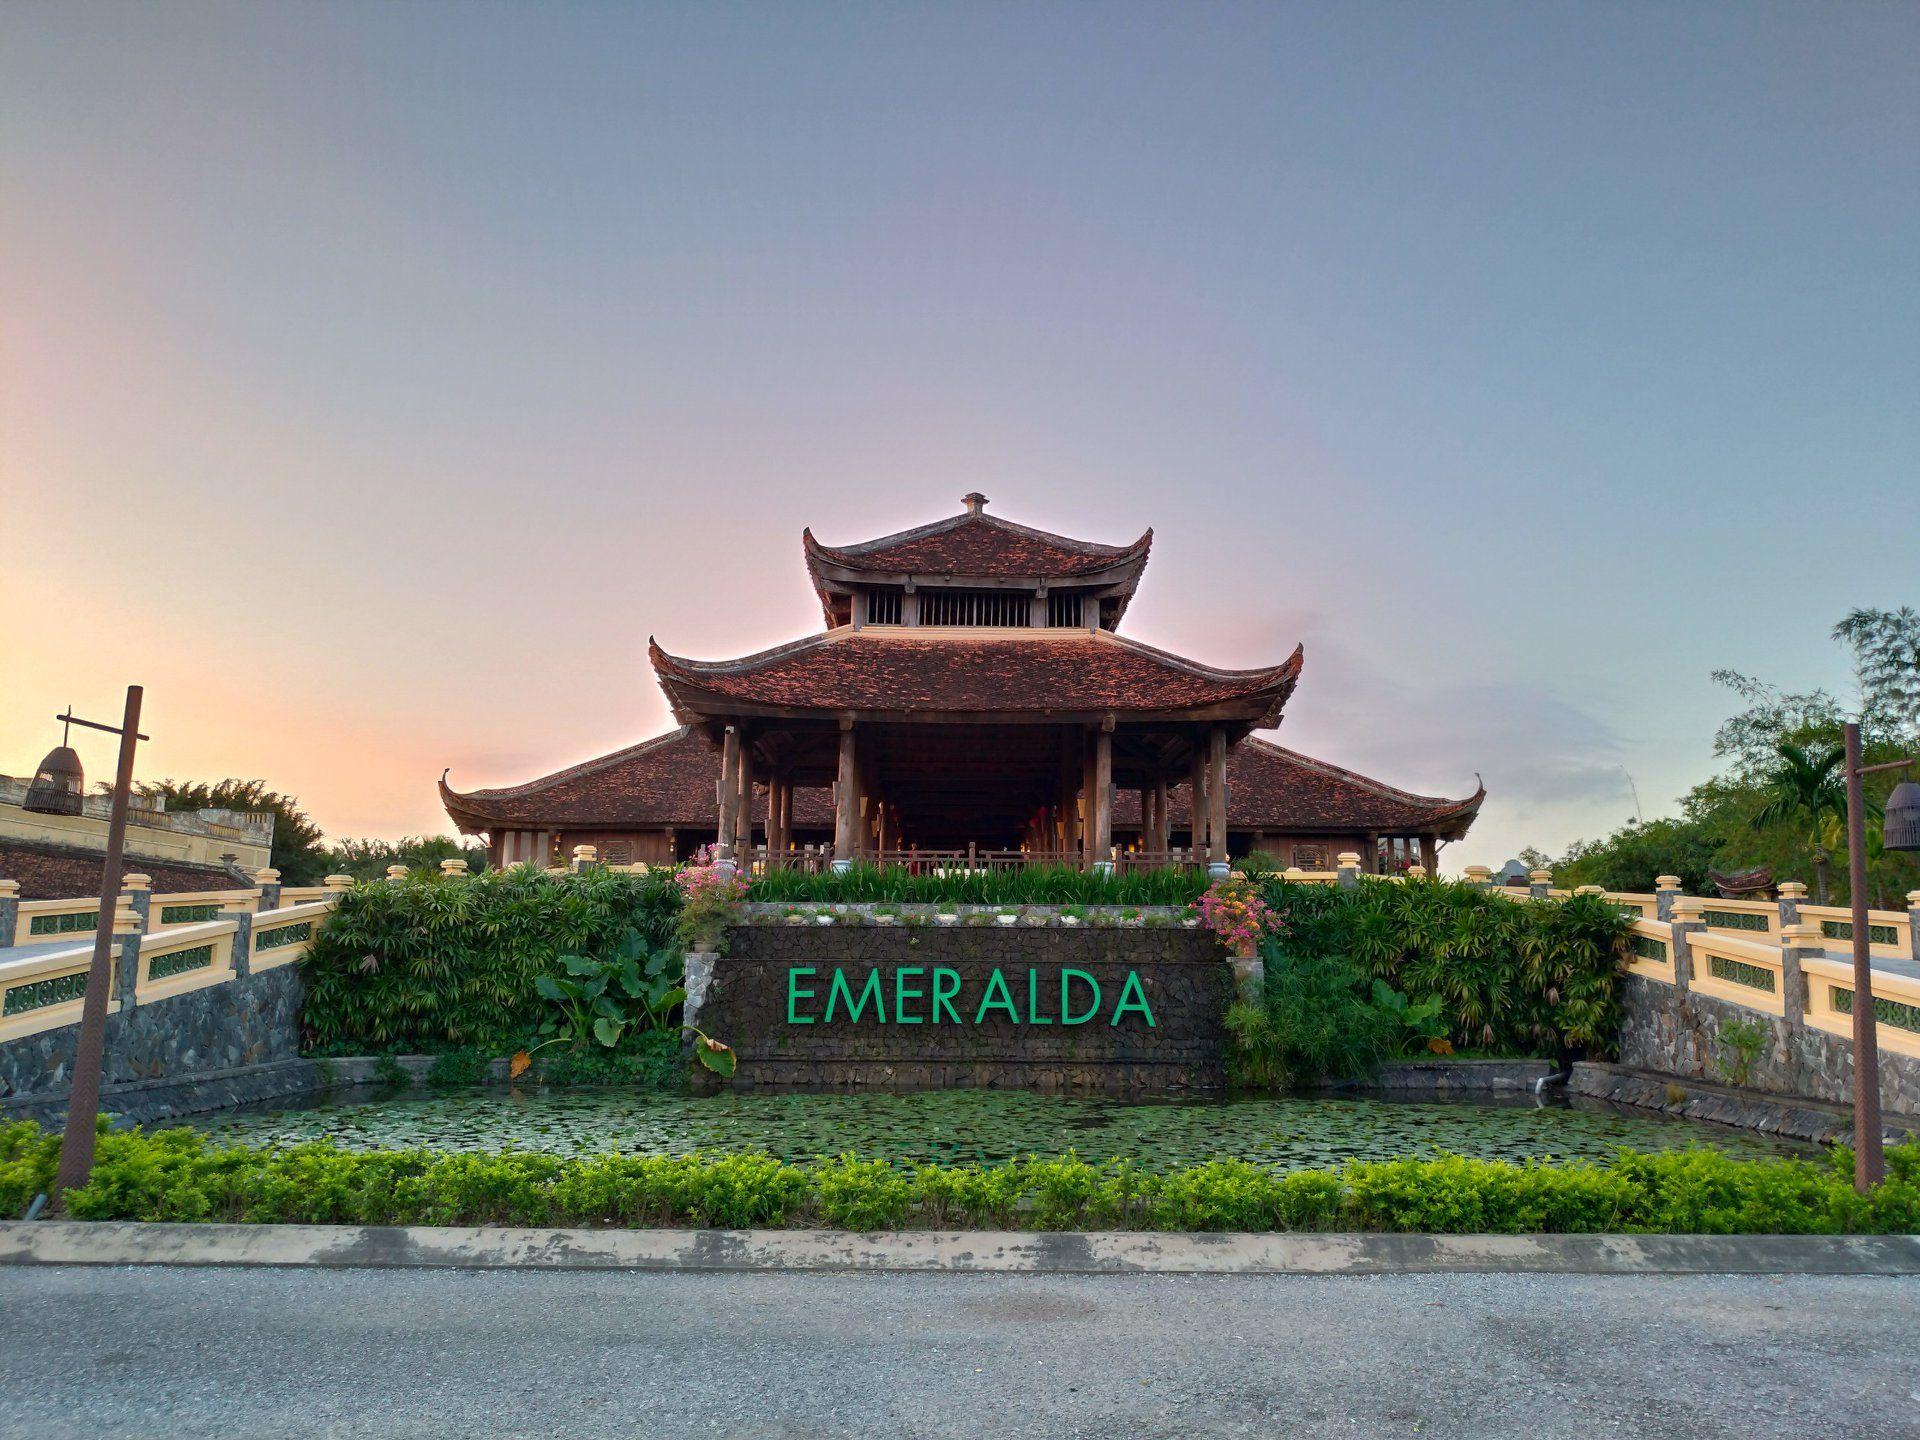 khuon vien emeralda ninh binh resort and spa